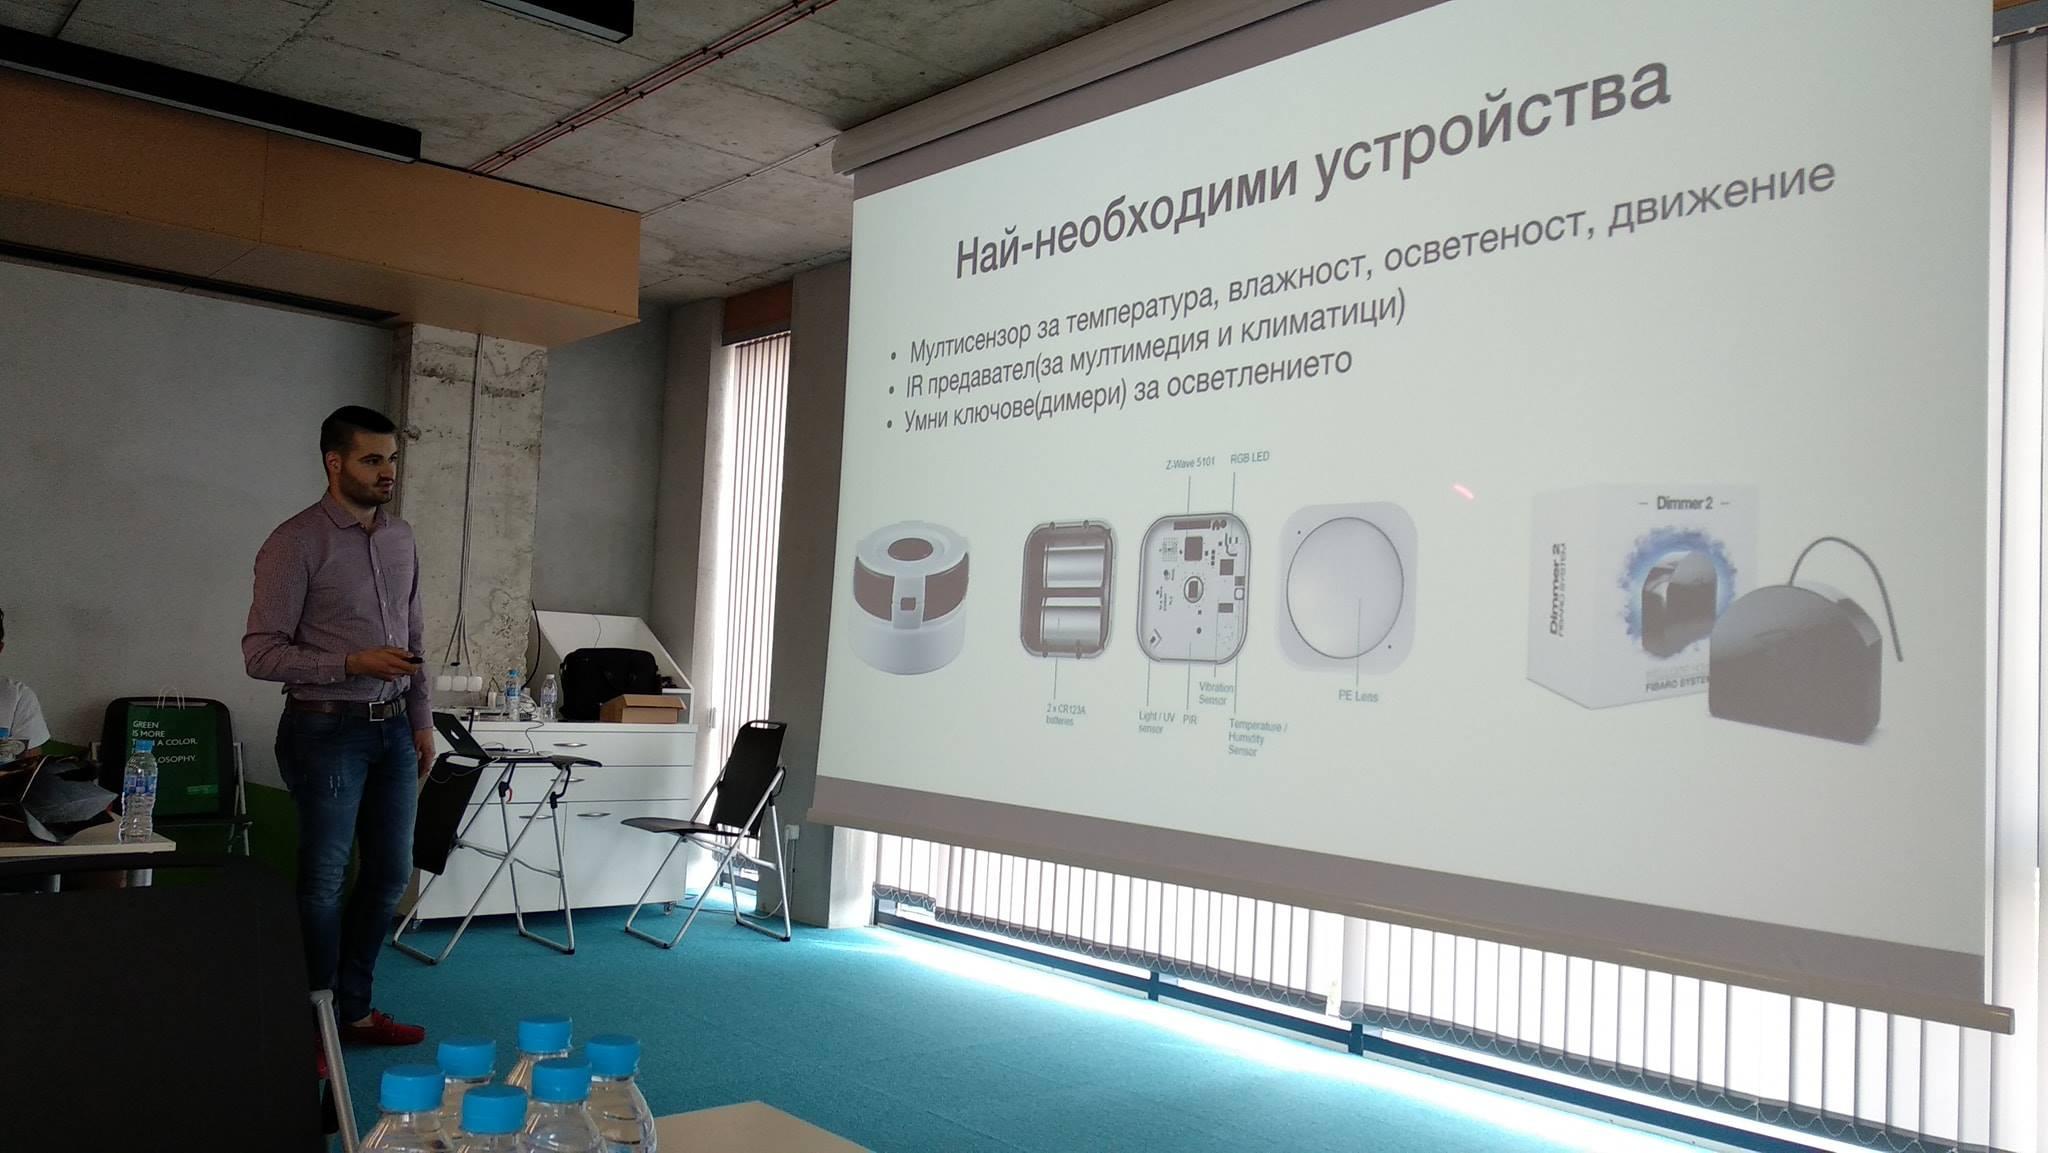 More Tuxcon activities in Plovdiv